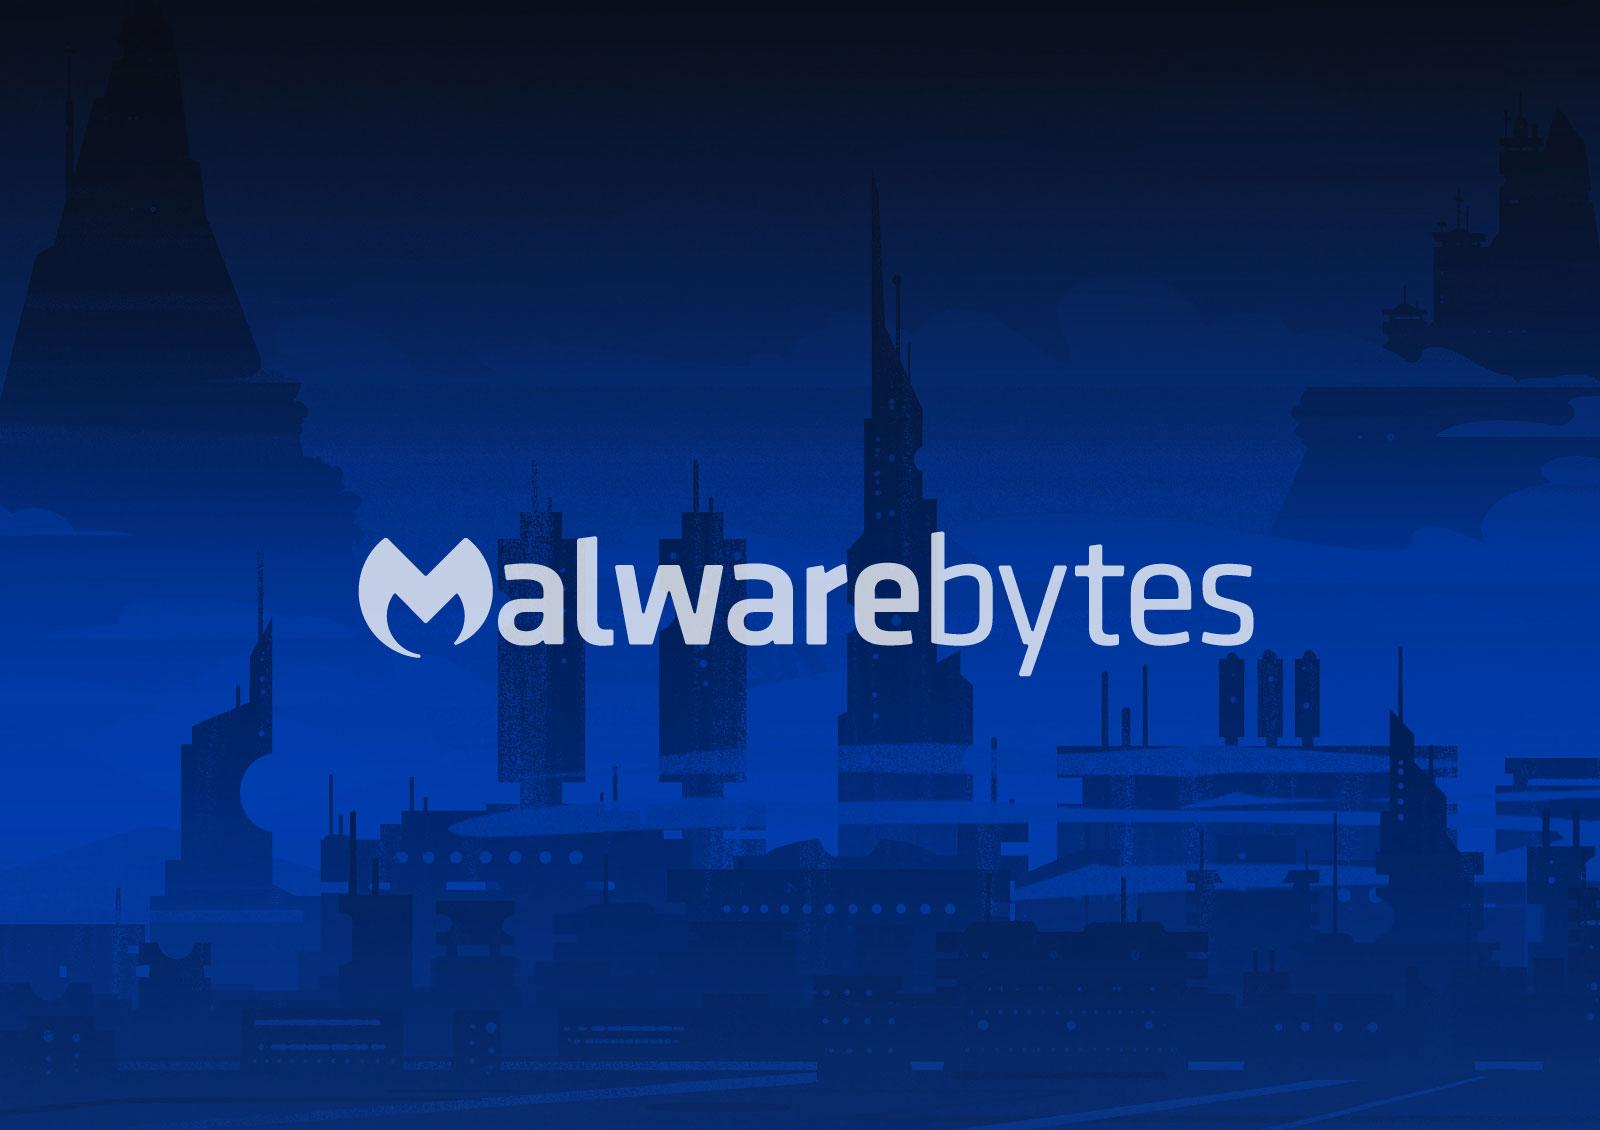 Marcin Kleczynski, of Malwarebytes: Estonia is a great place